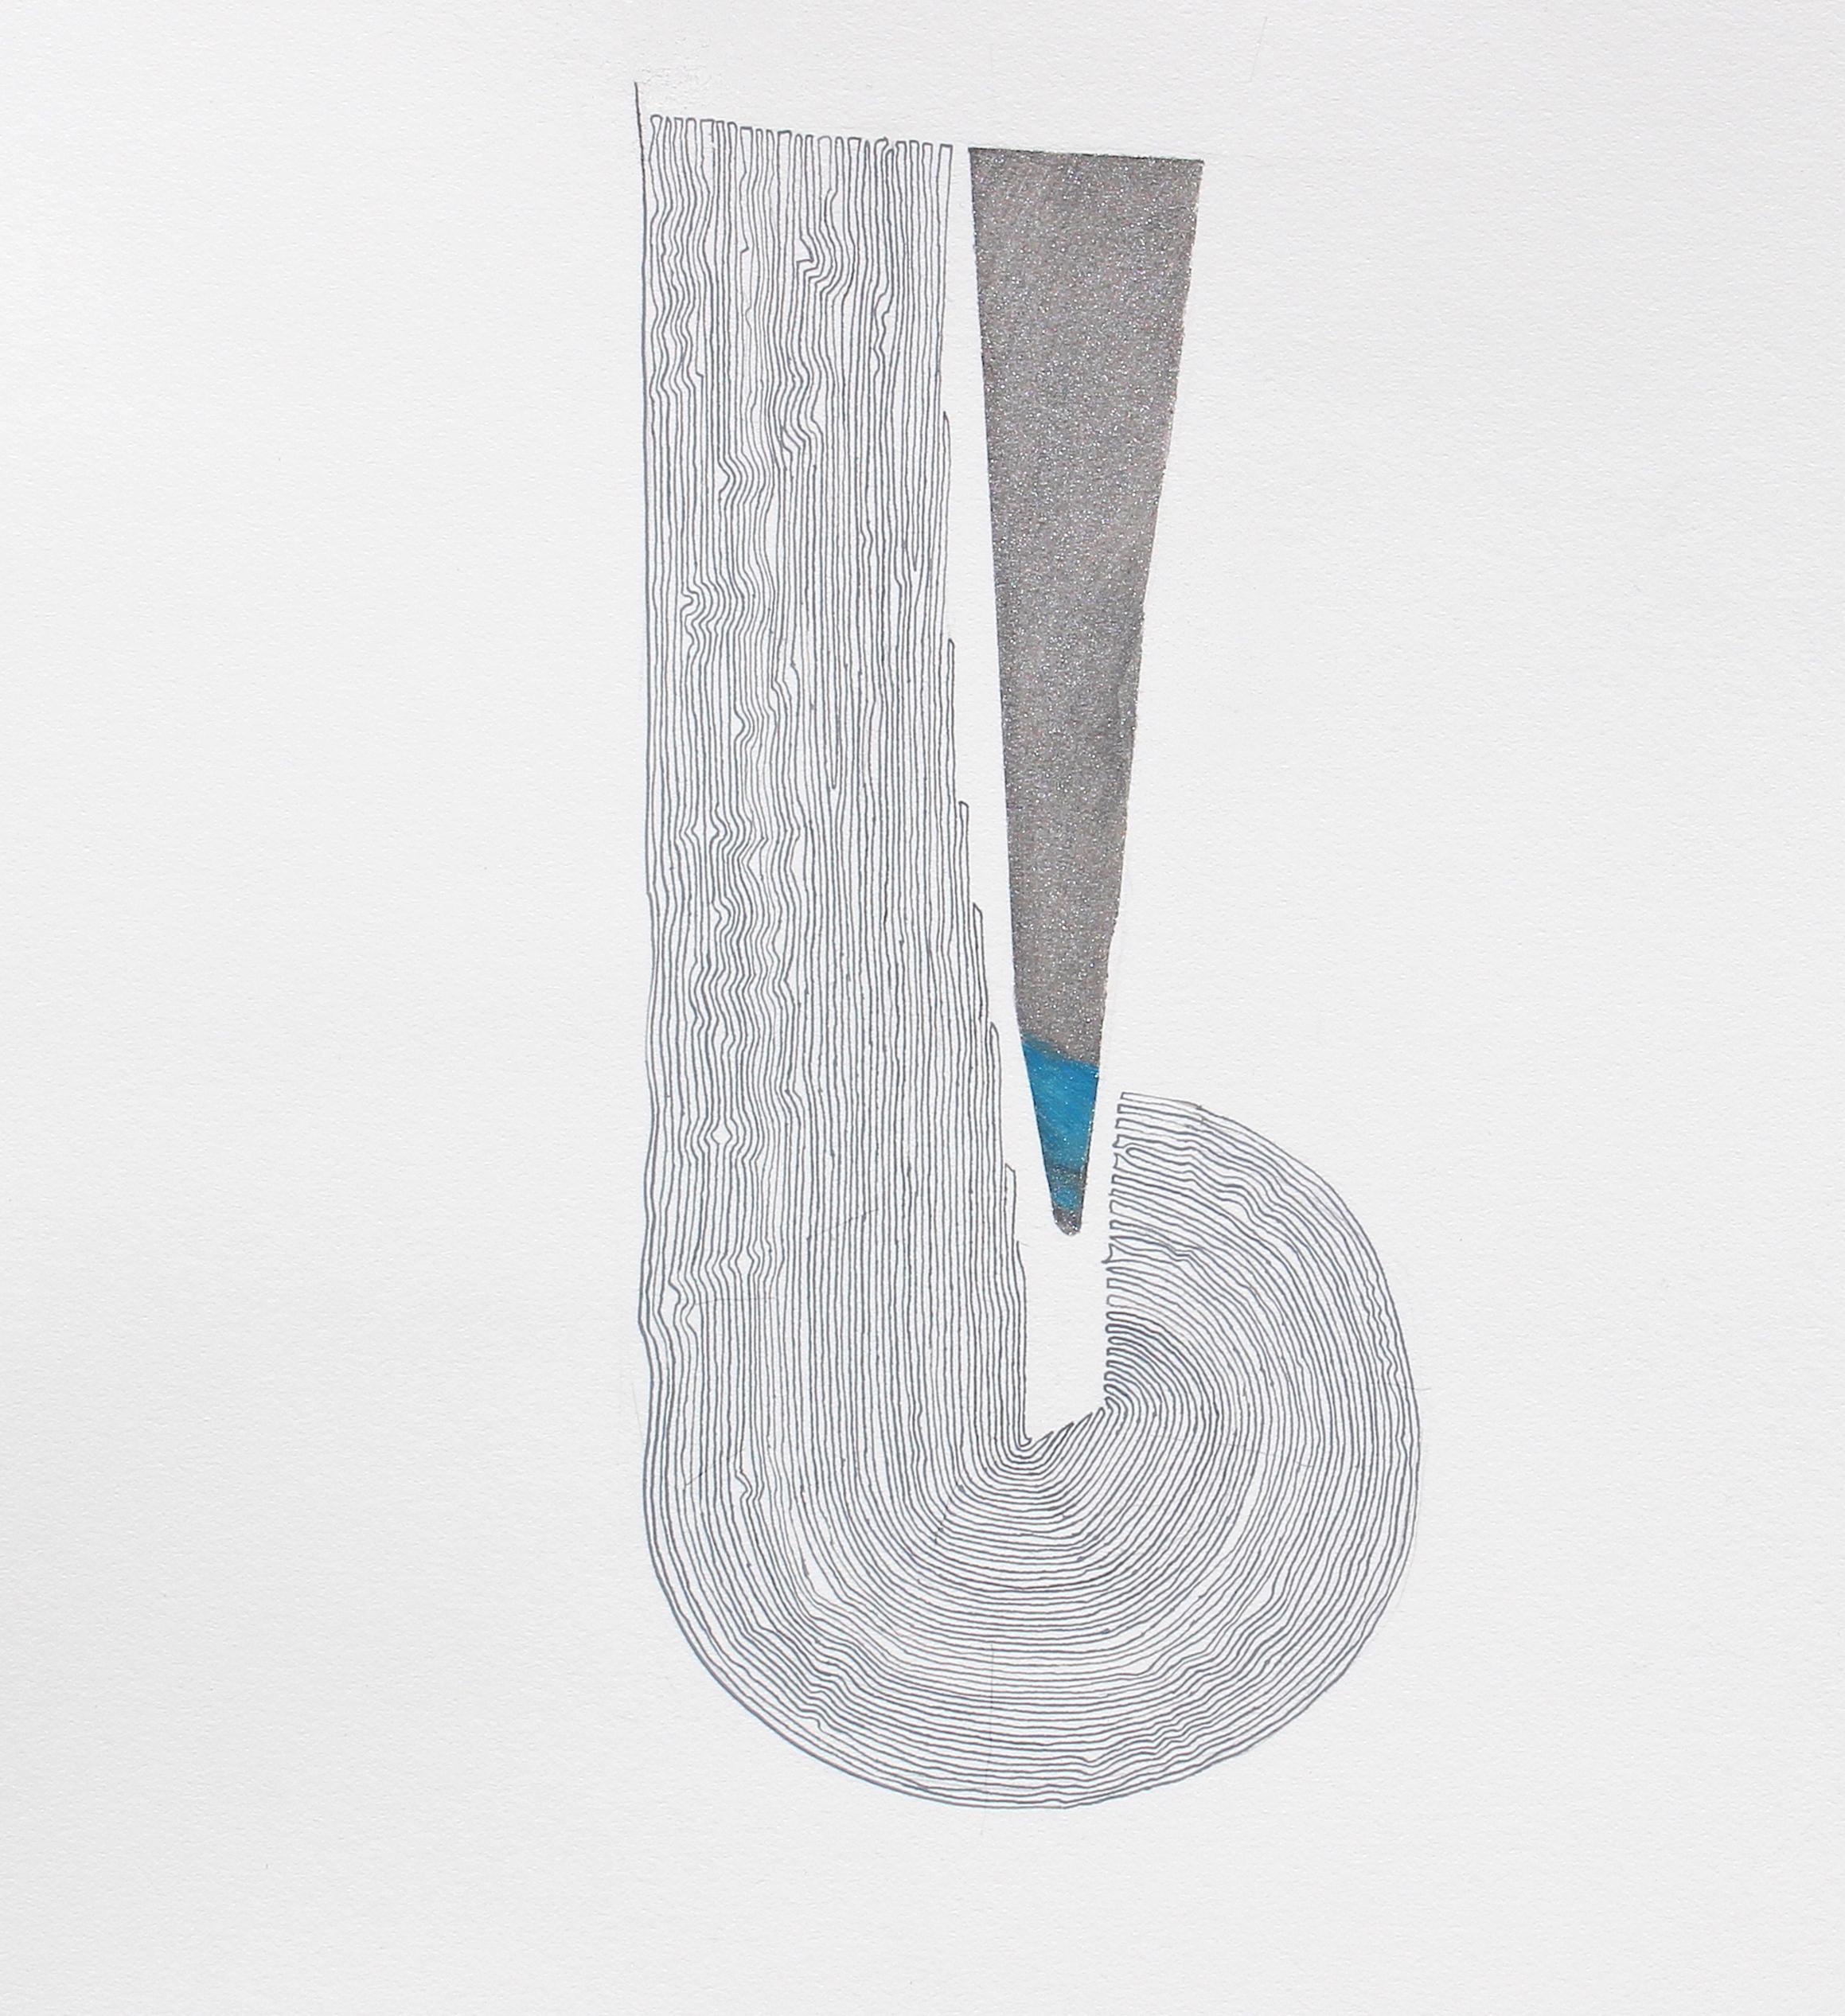 Joel Moskowitz, Needle and Thread, Acrylic on paper, 15x12